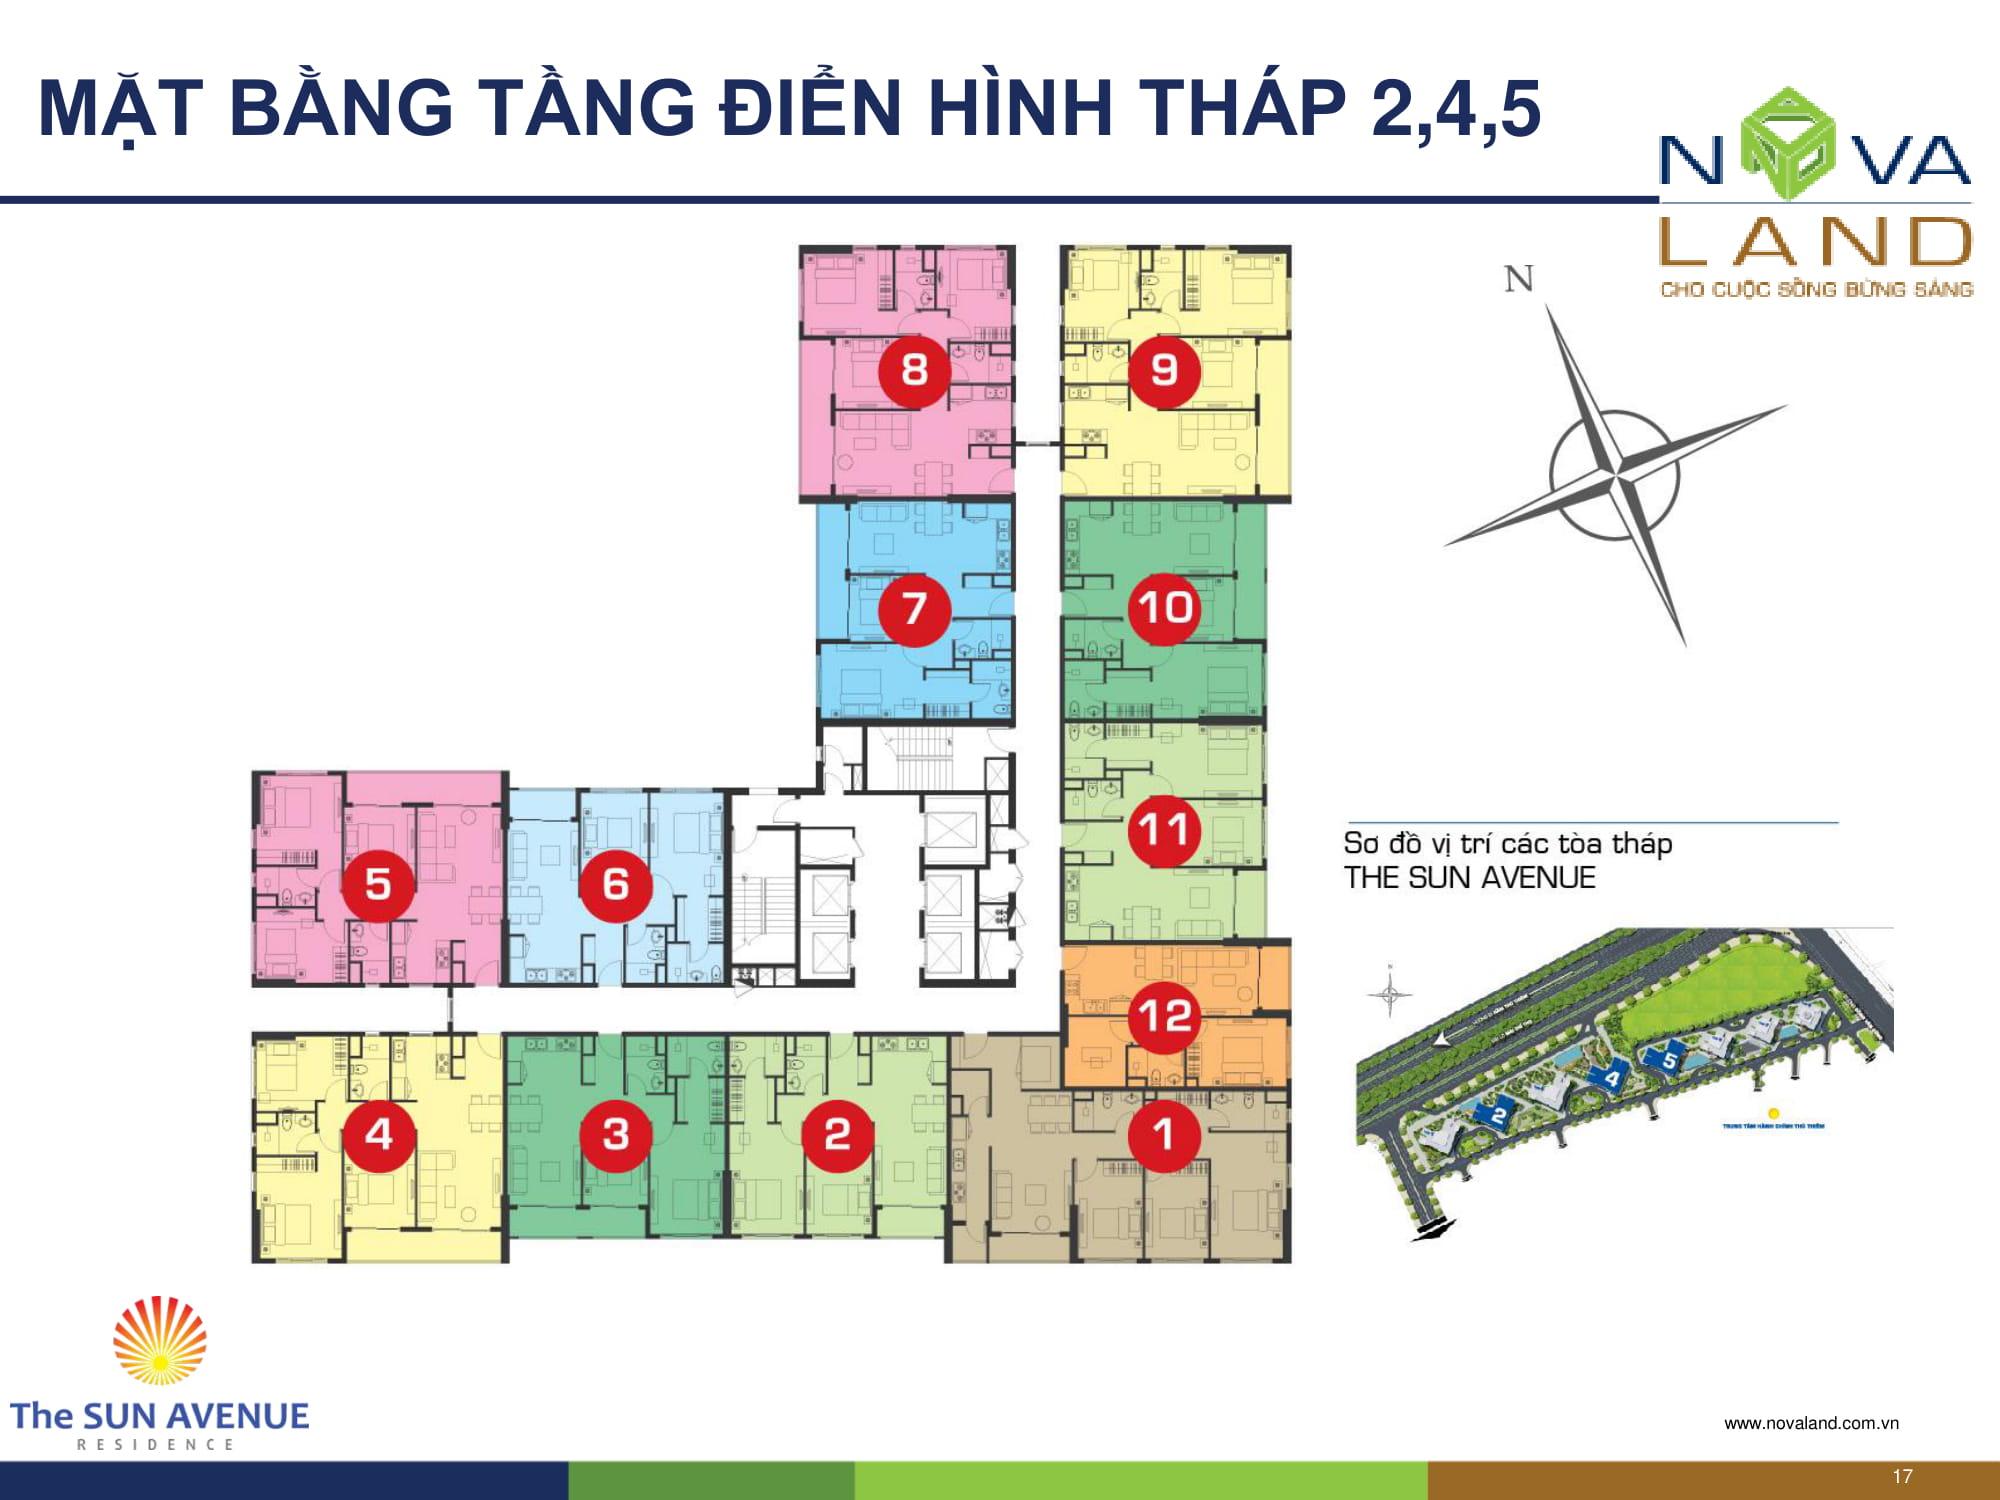 mat-bang-thap-2-4-5-the-sun-avenue